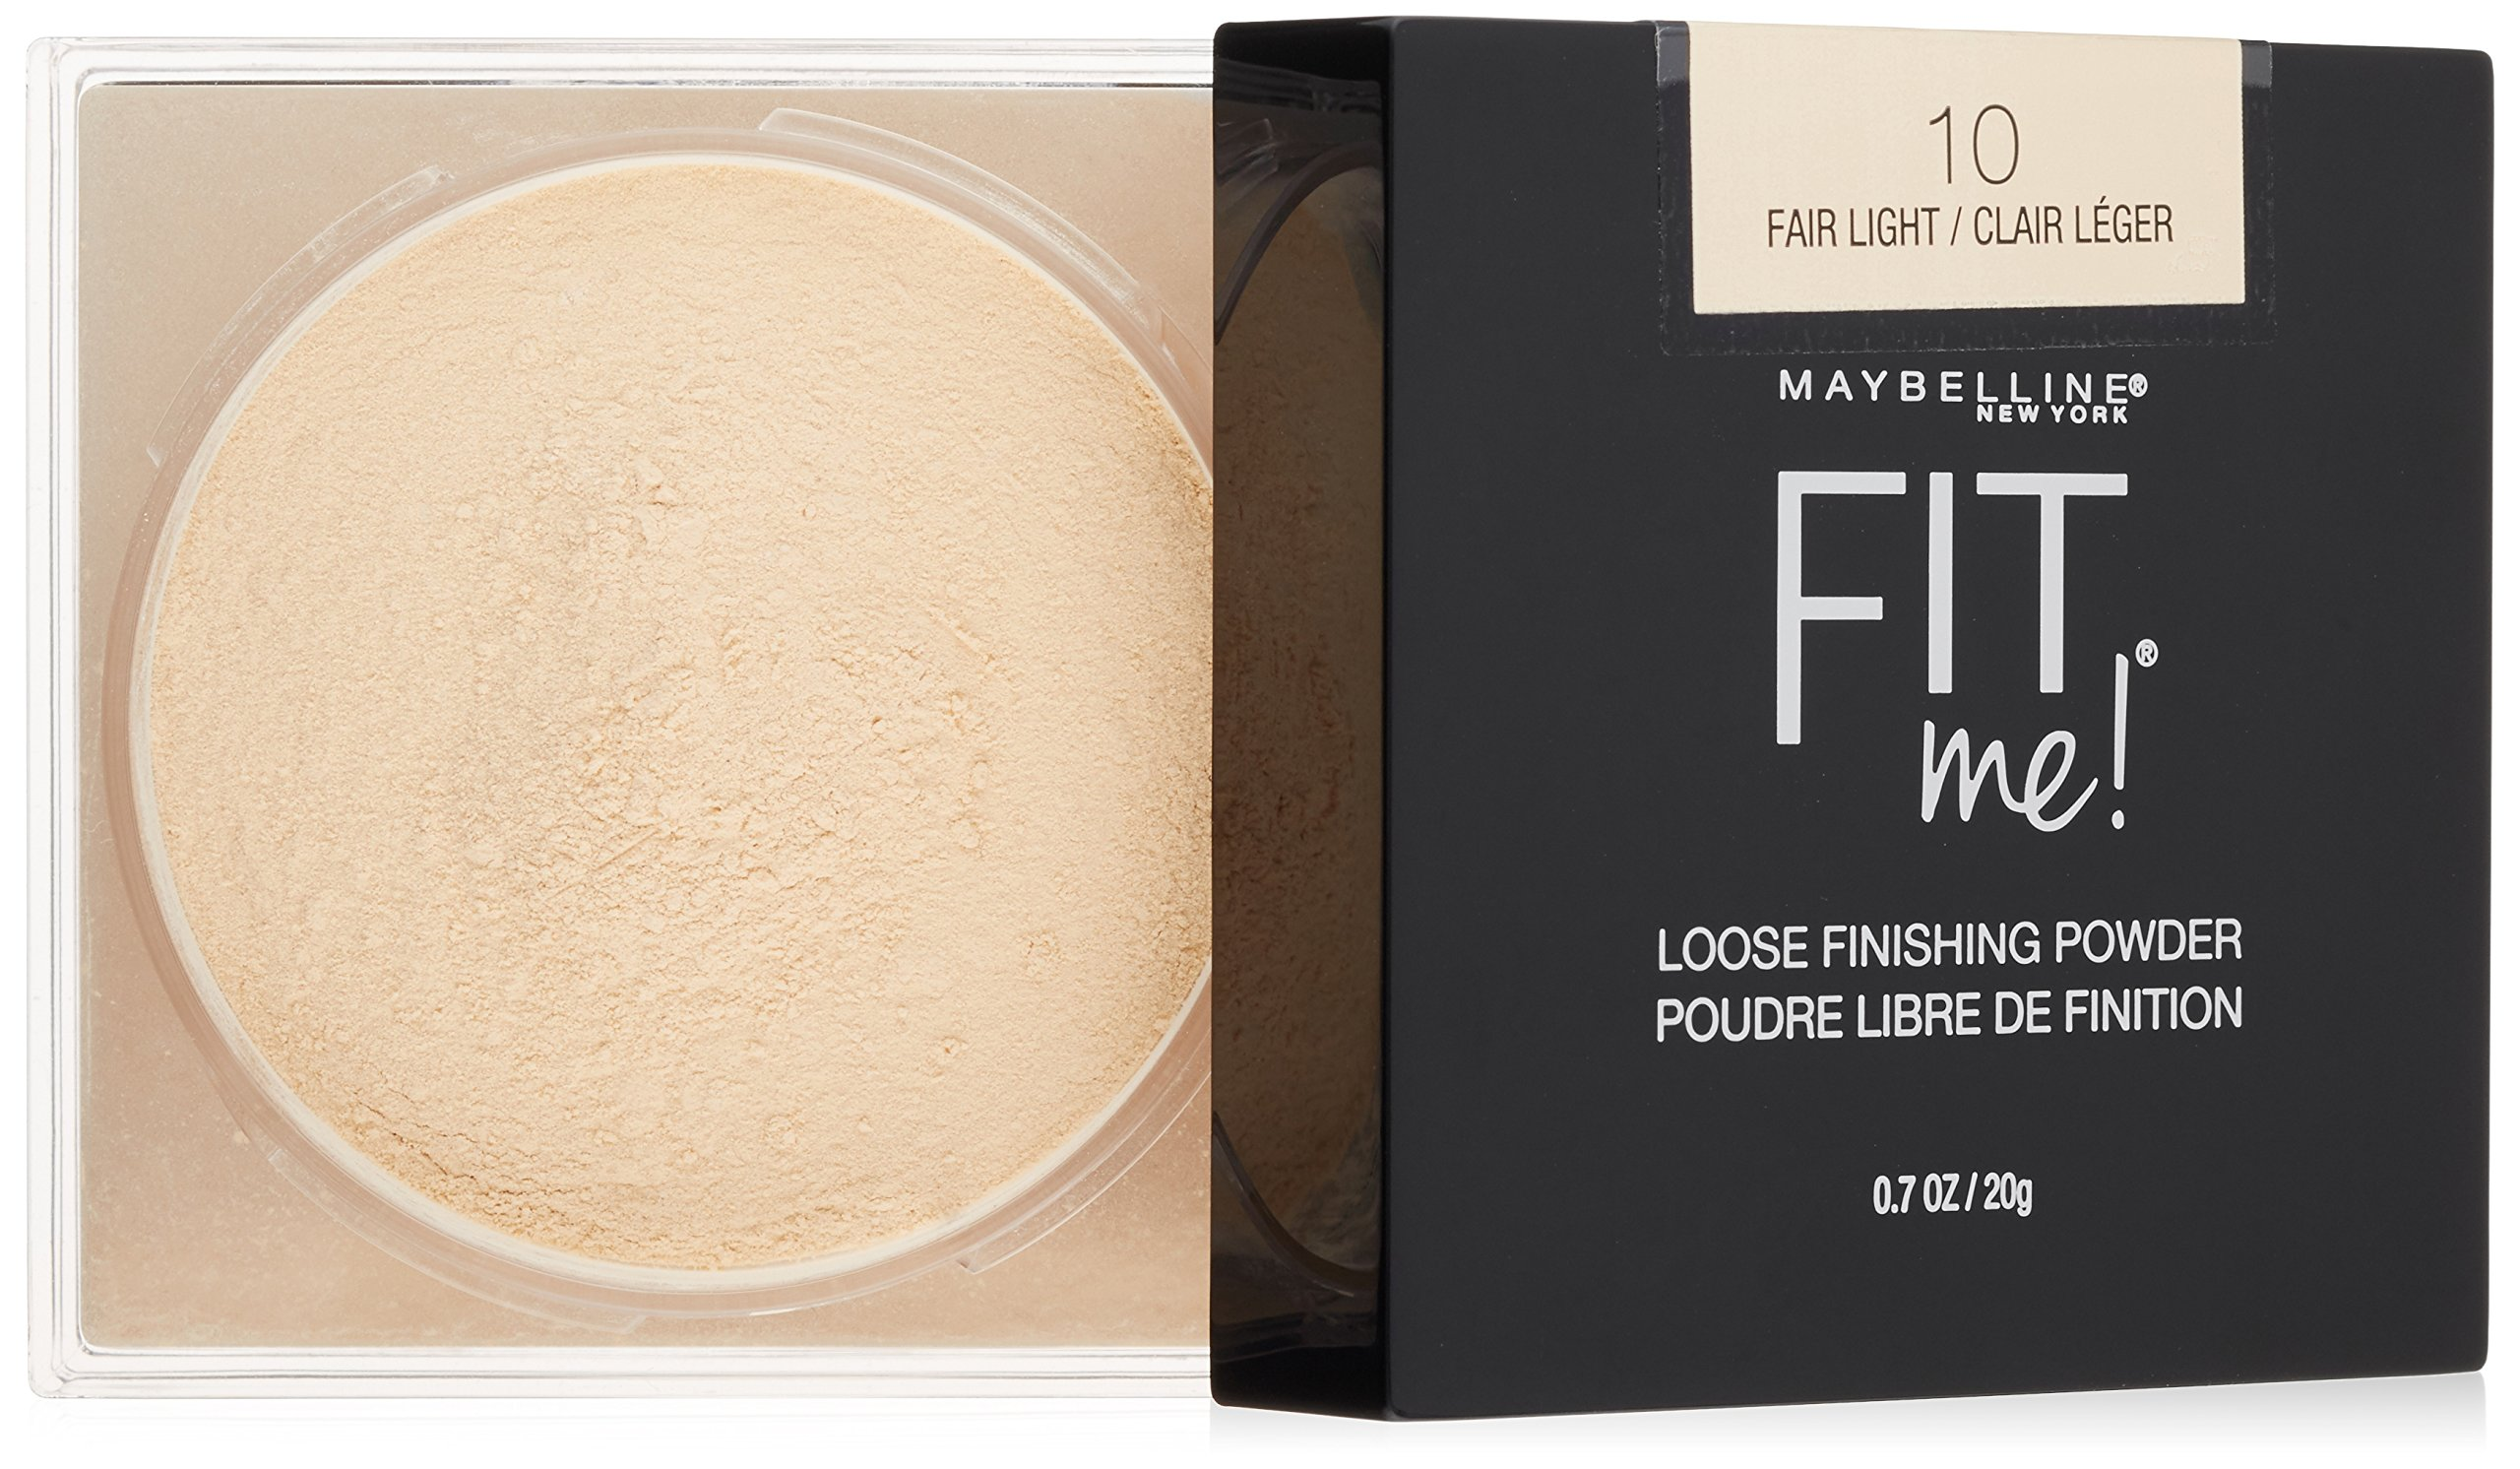 Maybelline Fit Me Loose Finishing Powder, Fair Light, 0.7 oz.